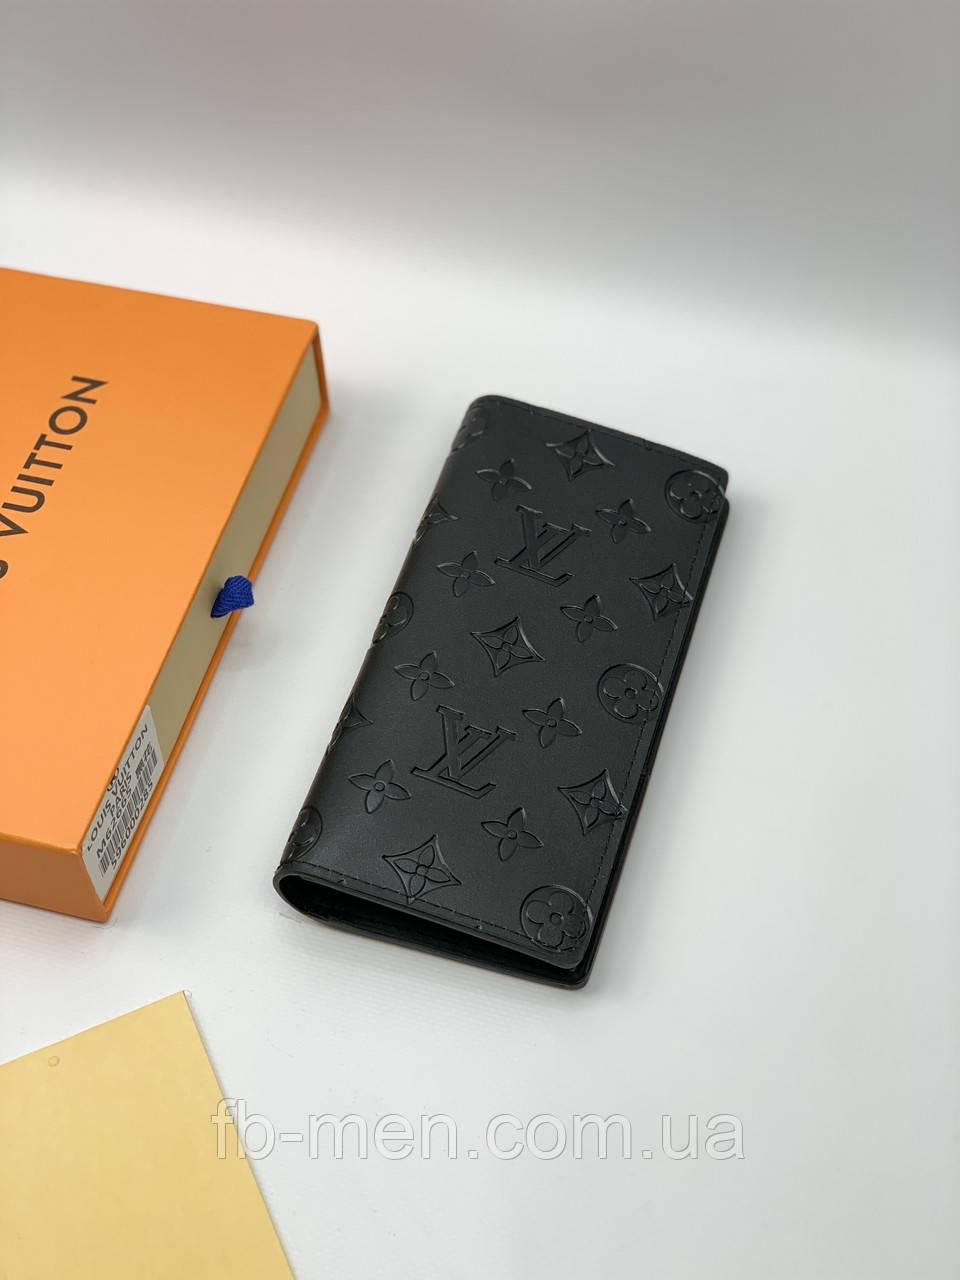 Бумажник Louis Vuitton черный принт монограмм | Кошелек без змейки Луи Виттон | Кошелек Луи Виттон мужской